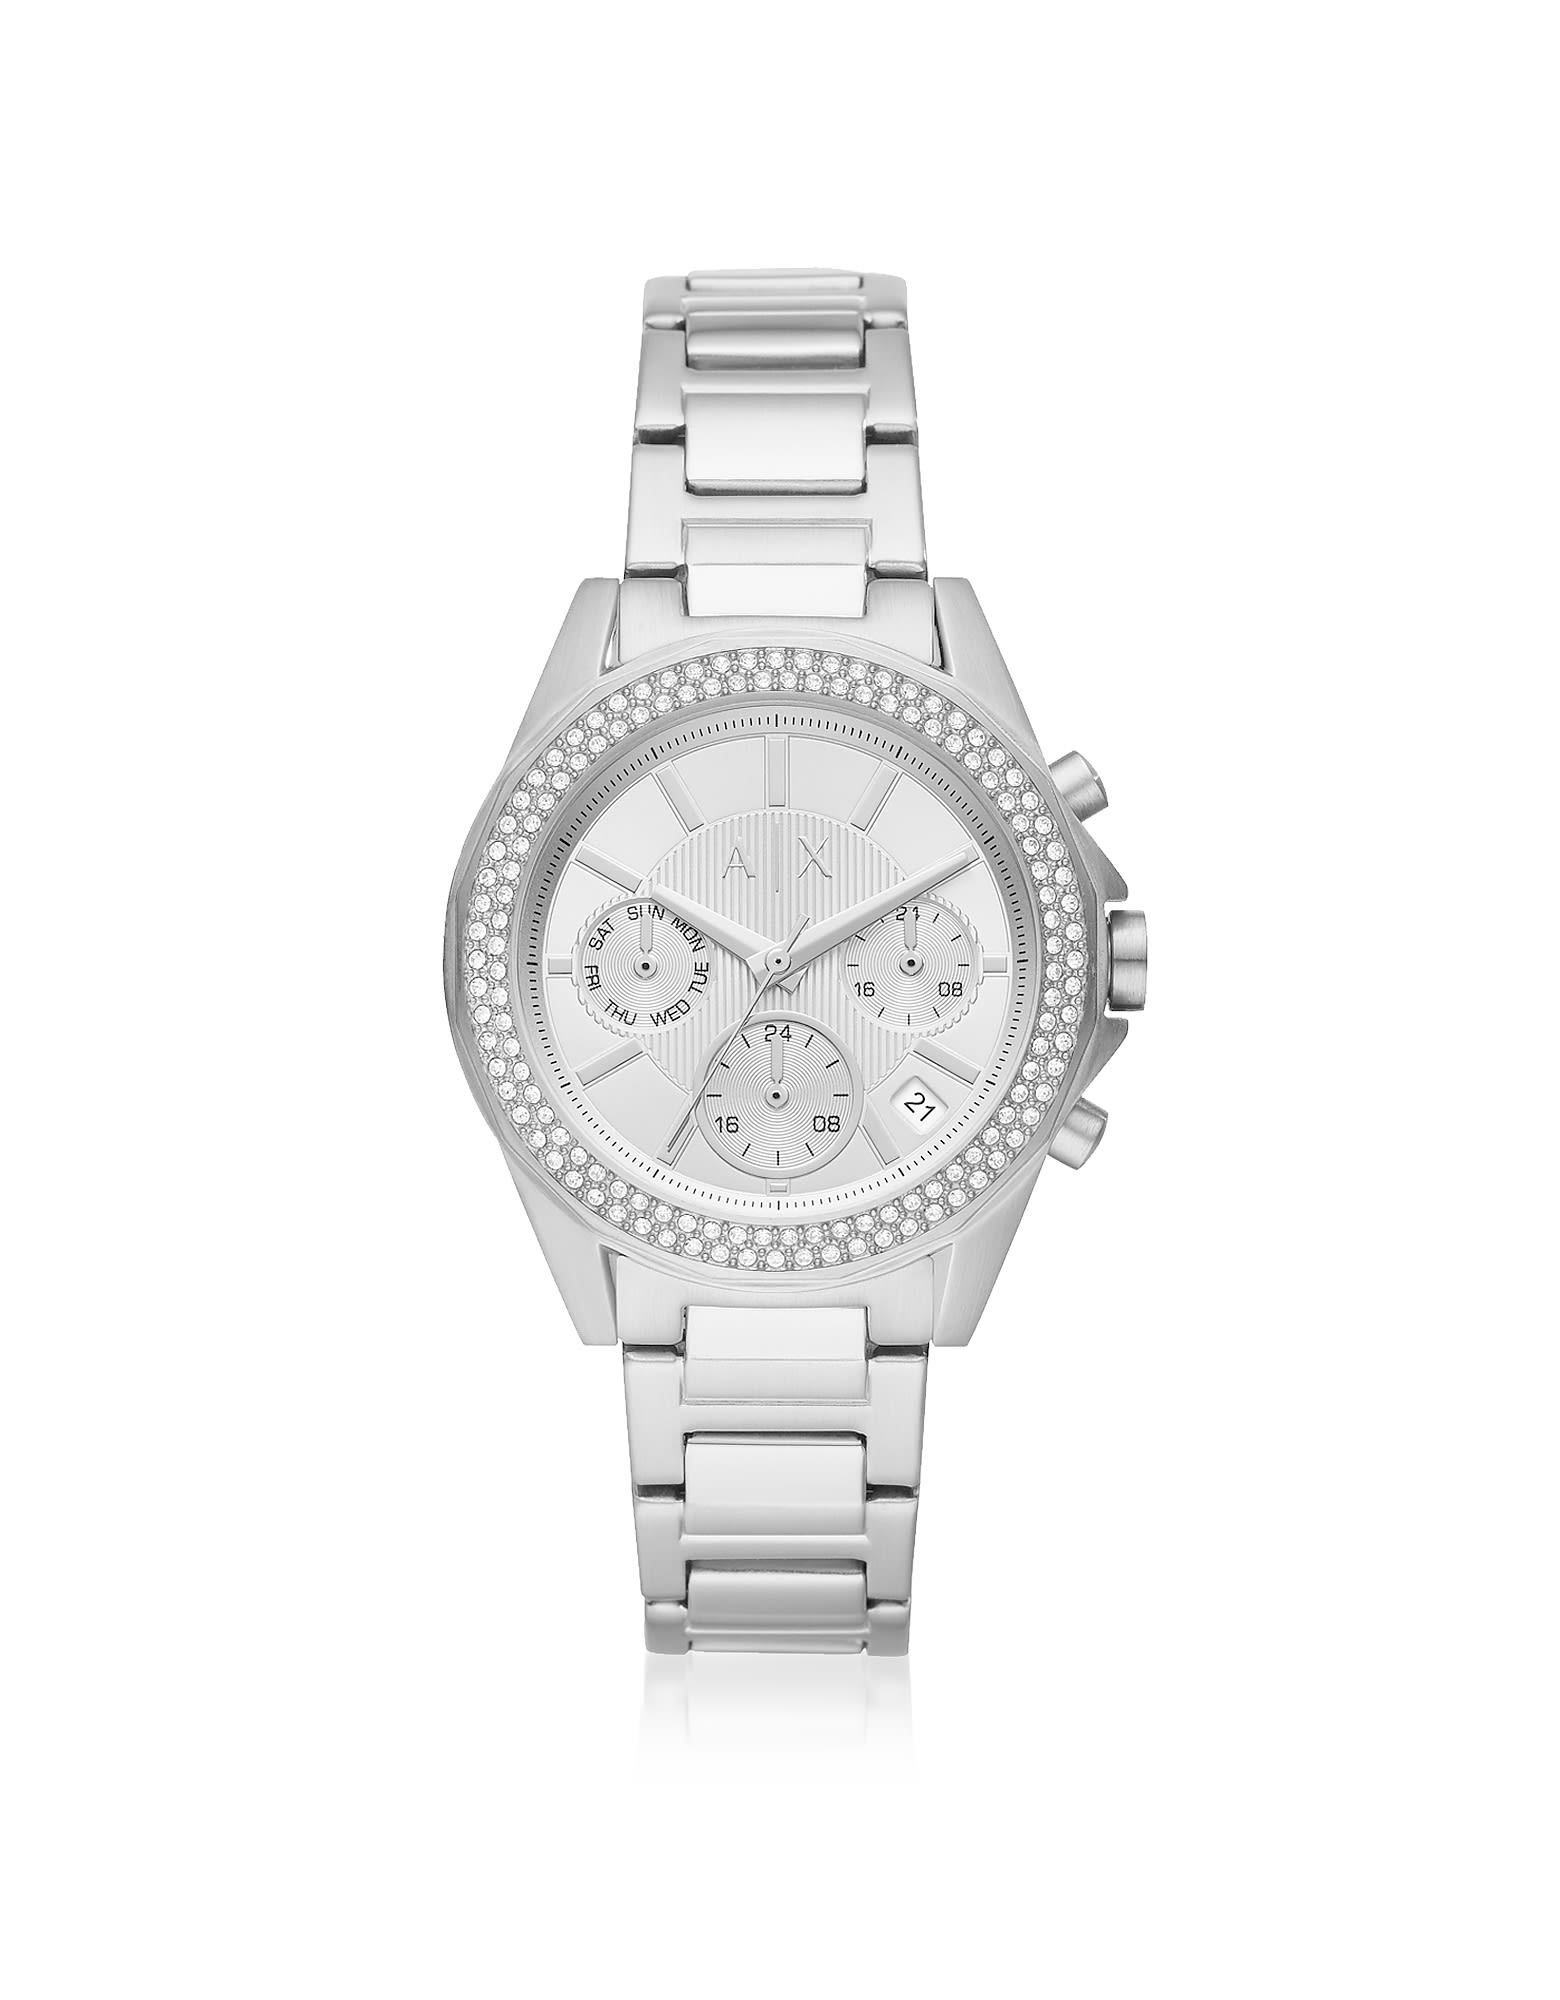 Armani Exchange Lady Drexler Stainless Steel Chronograph Watch